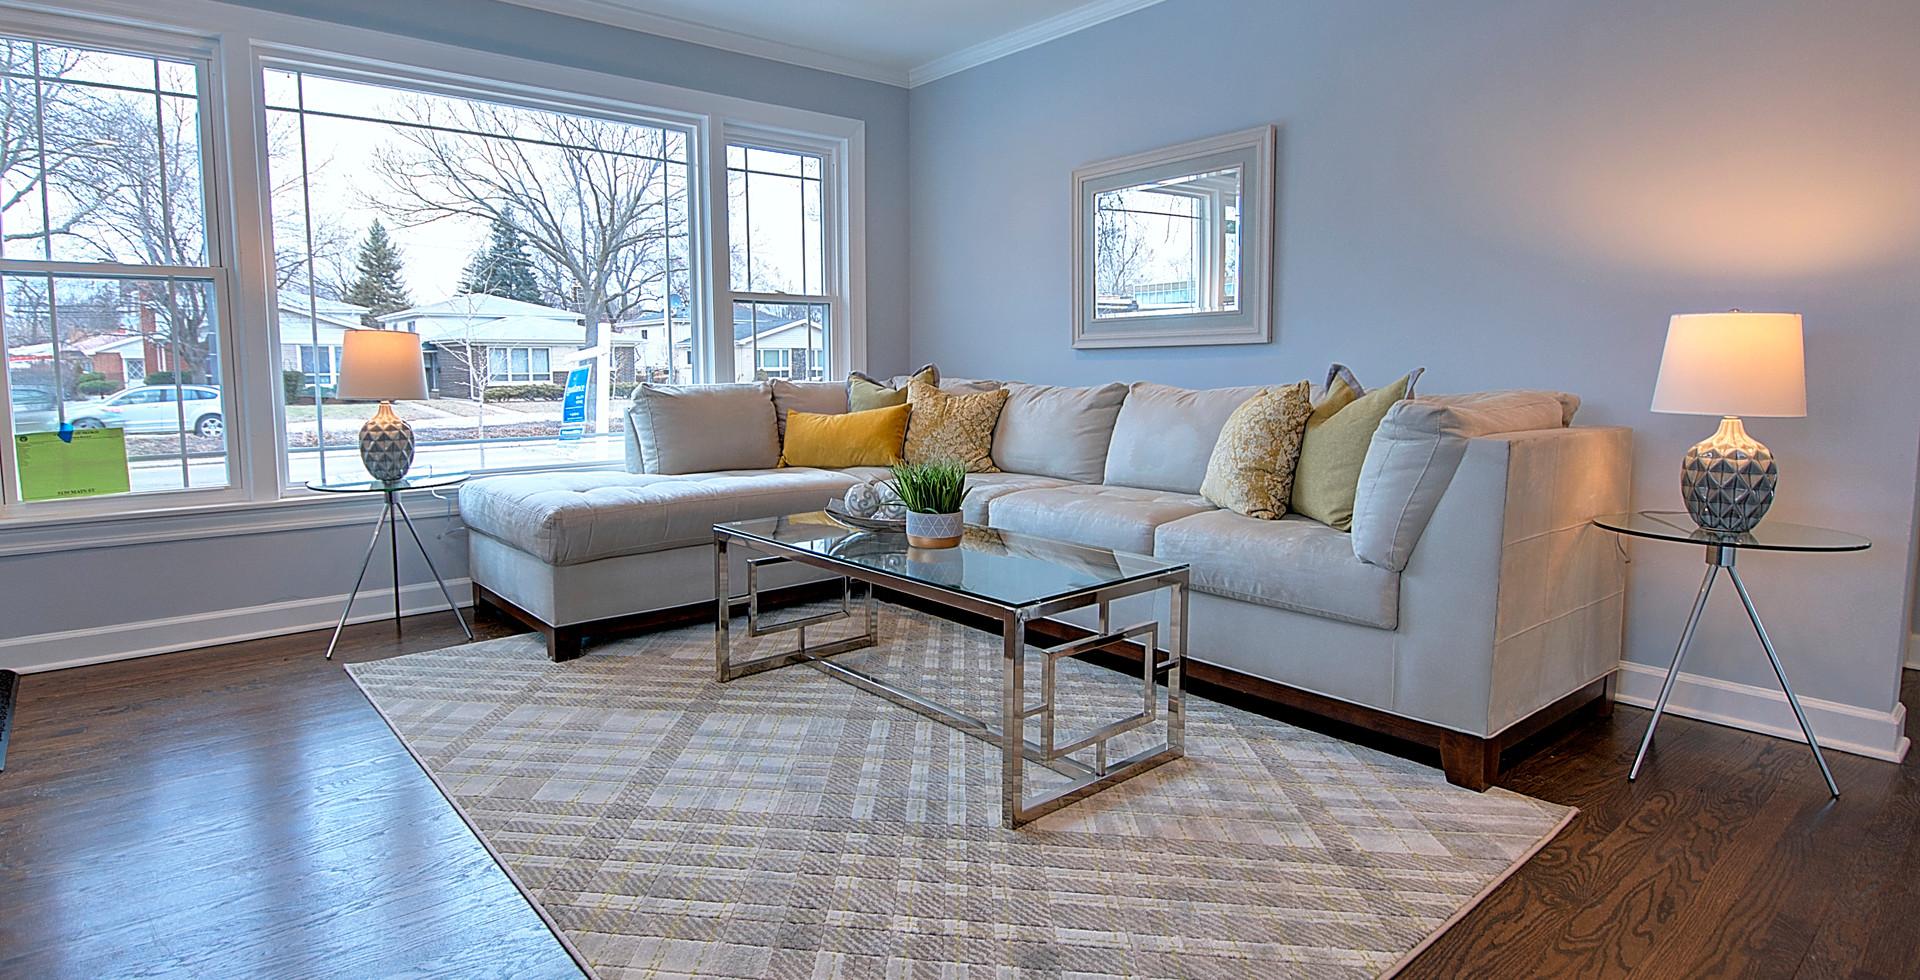 Living Room in Burbank designed by MRM Home Design.jpg